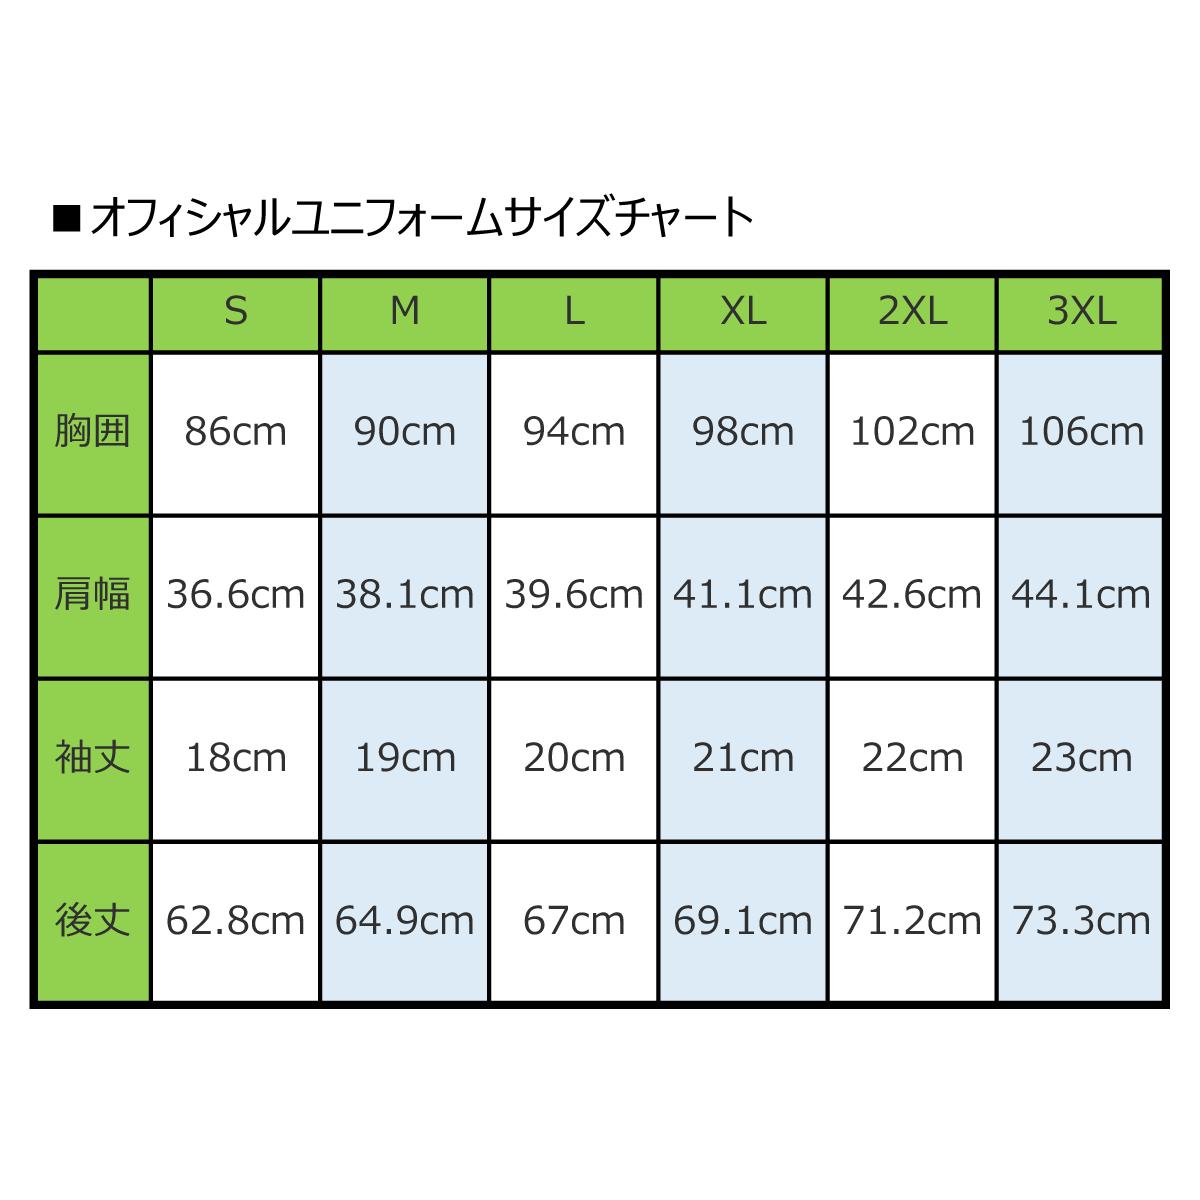 JTサンダーズ広島 オフィシャルユニフォーム/2nd